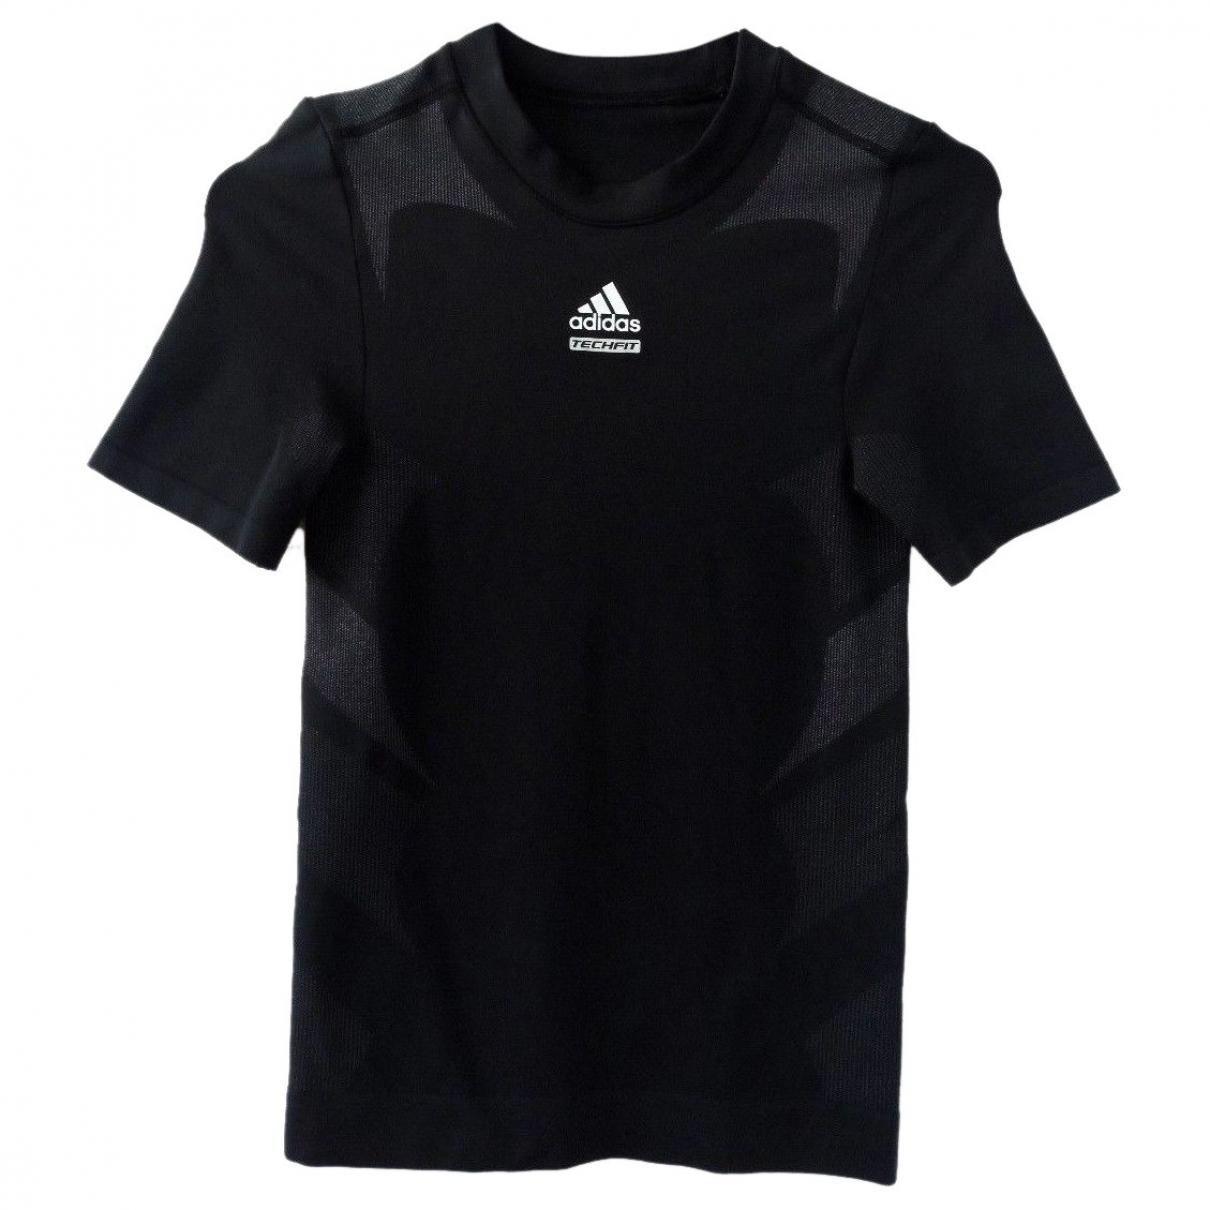 Adidas \N Top in  Schwarz Synthetik